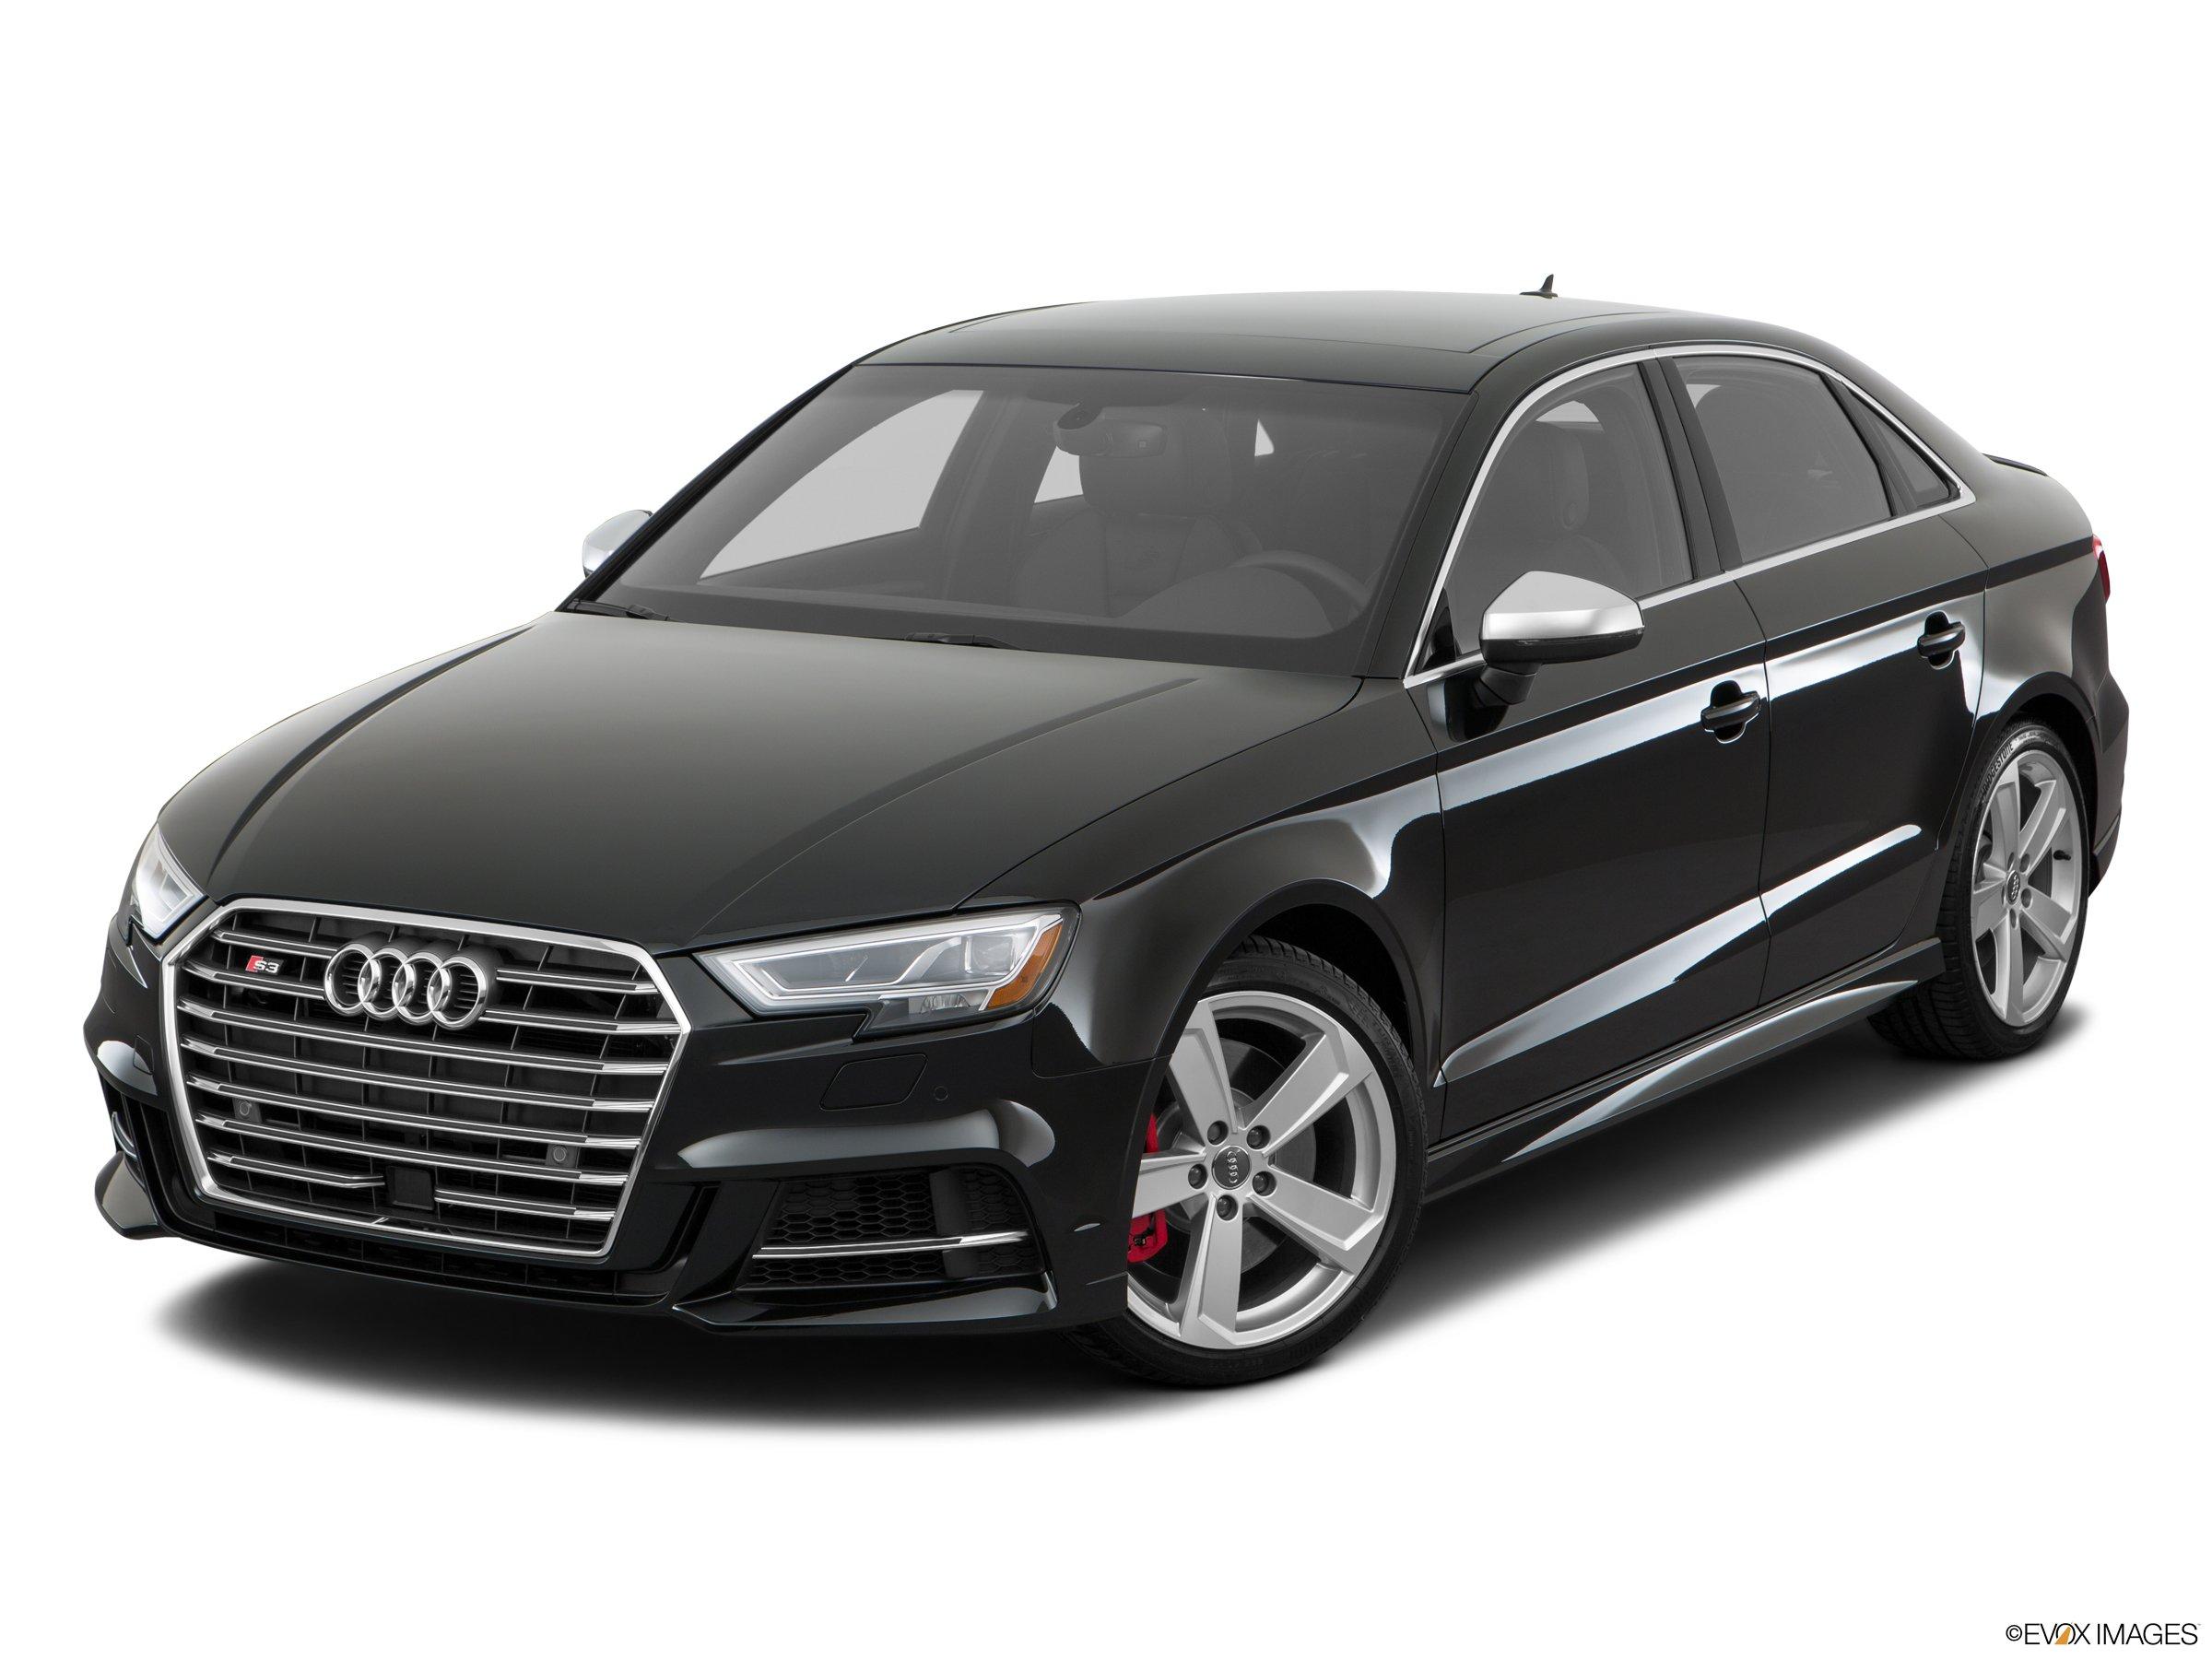 2020 Audi S3 Premium Plus 2.0 TFSI AWD sedan